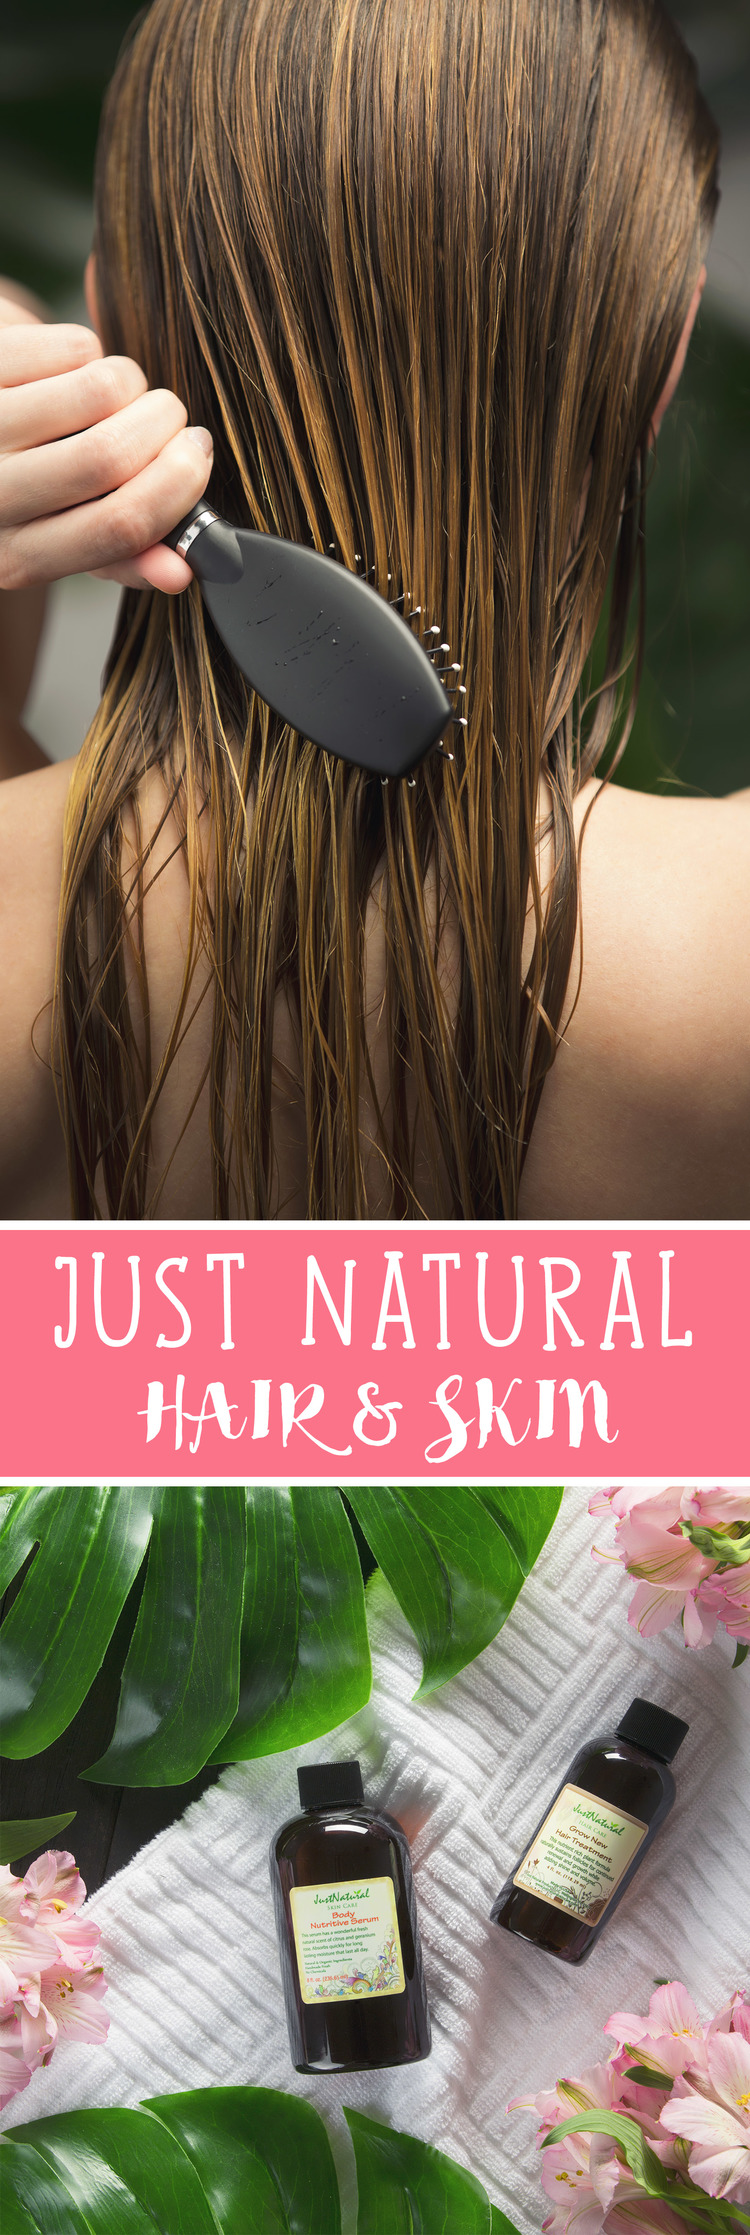 Just Natural Hair & Skin